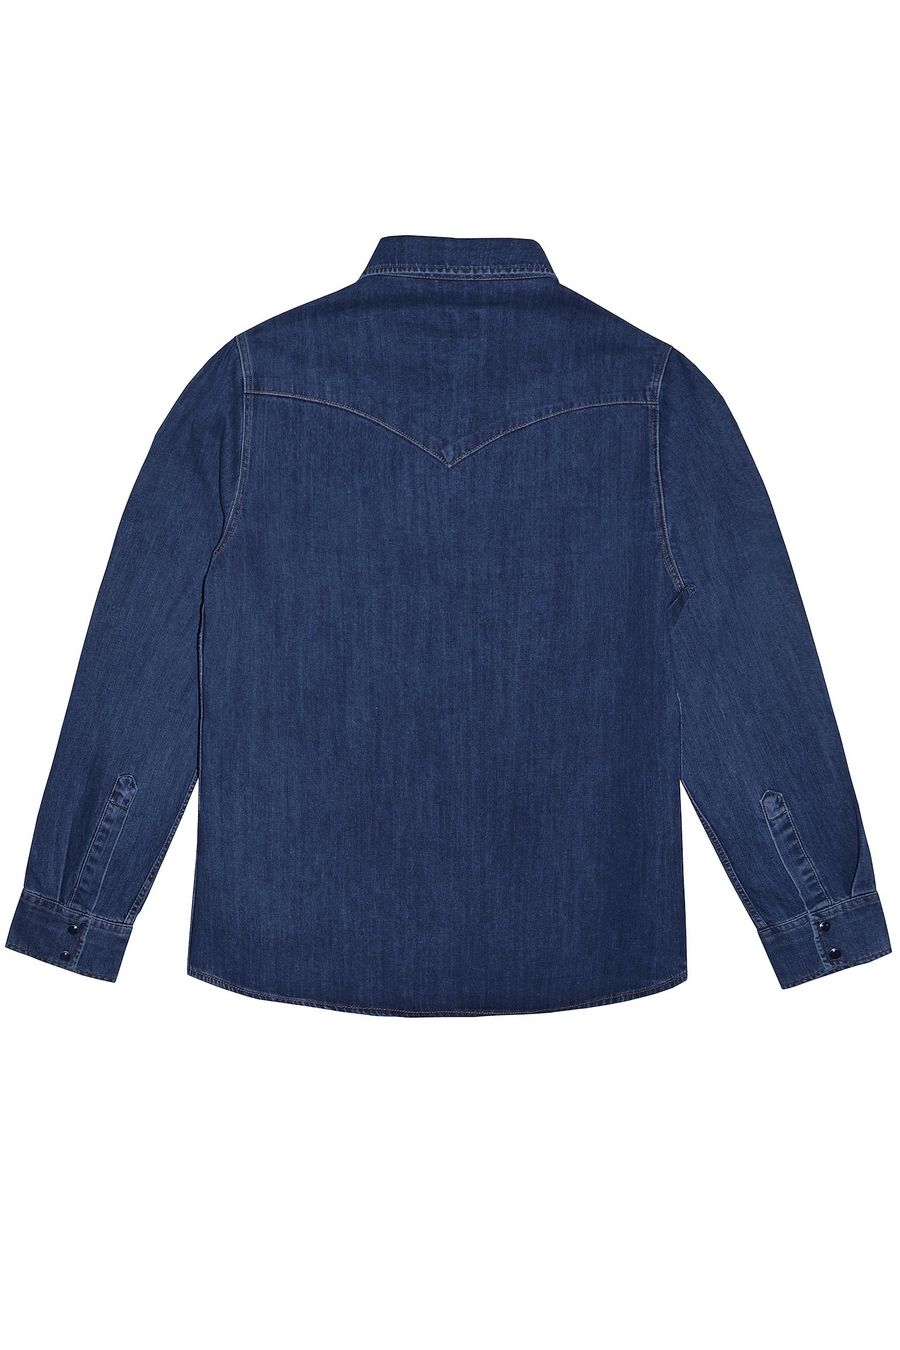 Рубашка мужская Koutons 1997 Talin Blue 02 - фото 2